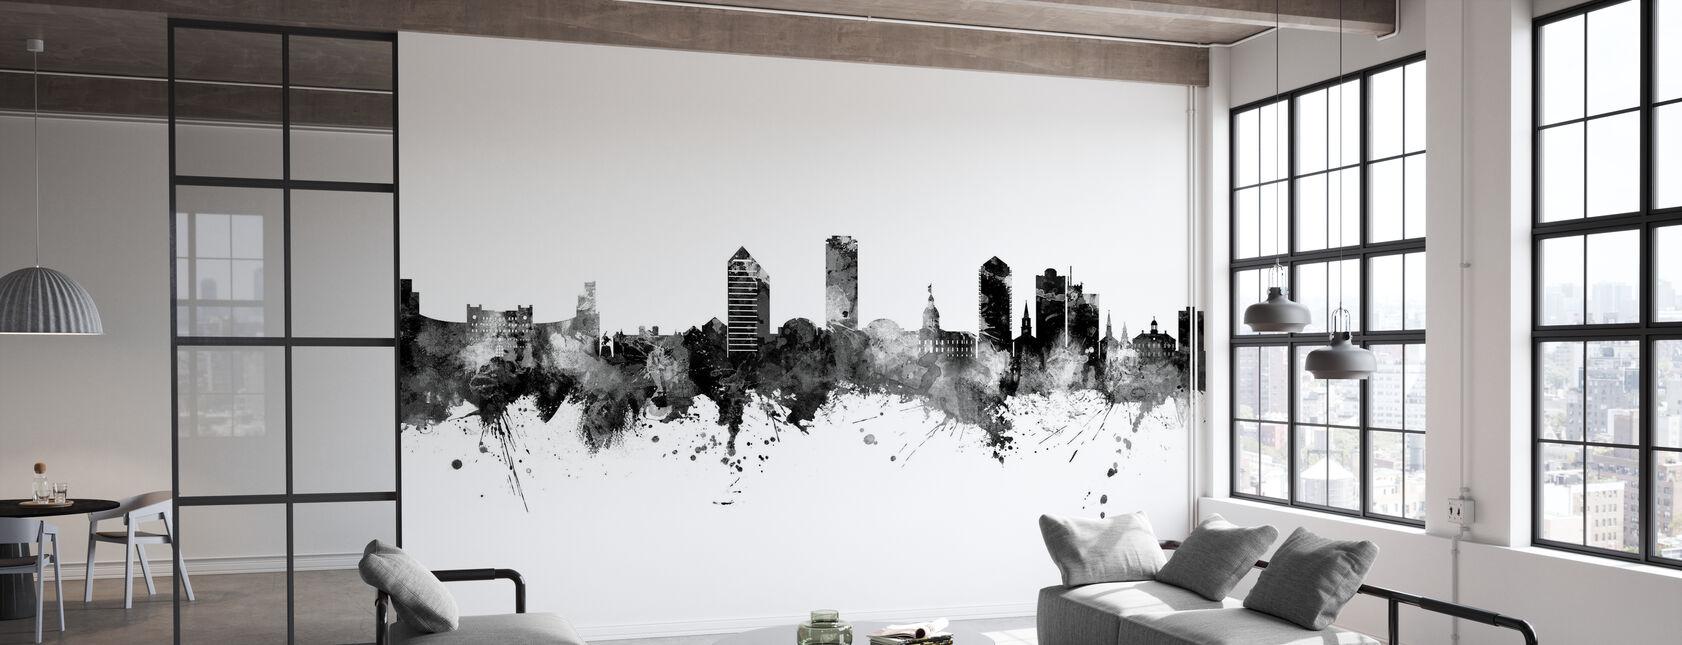 Tallahassee Florida Skyline - Wallpaper - Office